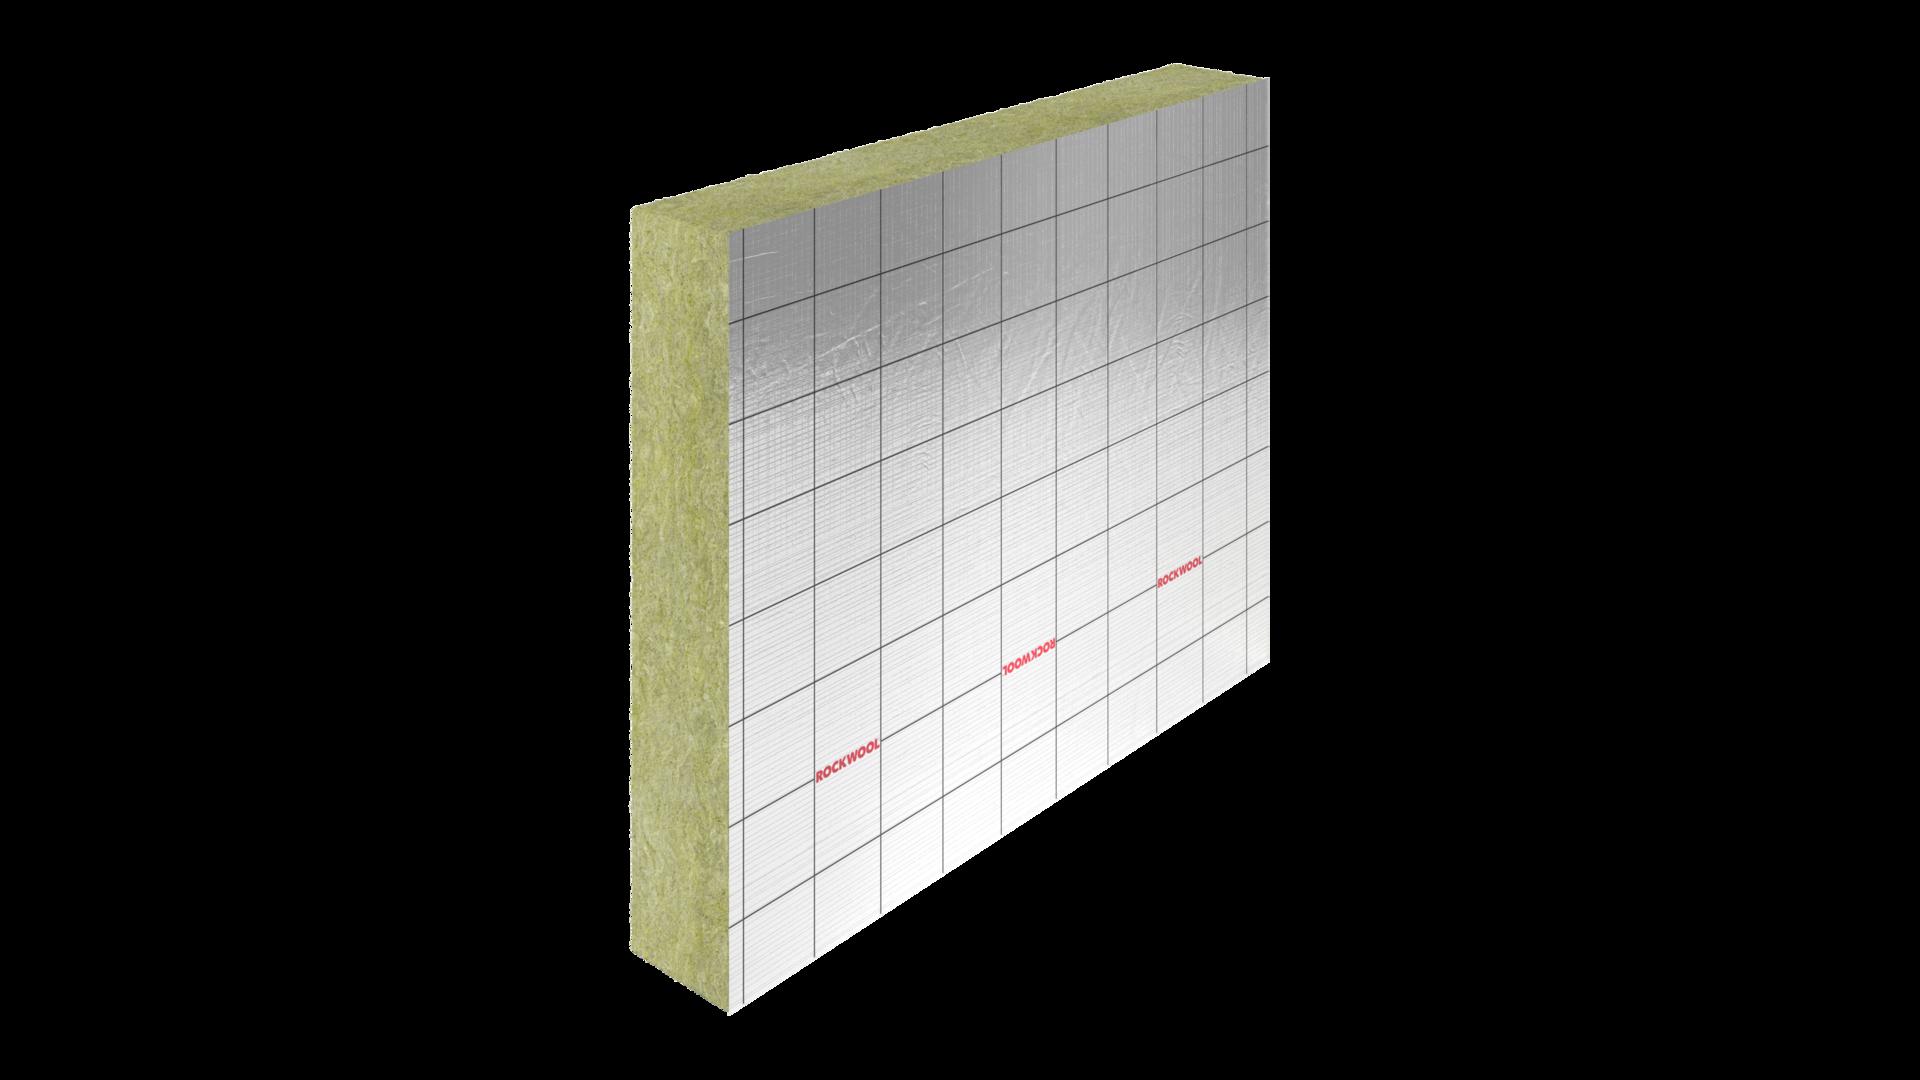 RockFit Mono Silver, productfoto, gevel, spouwmuurisolatie